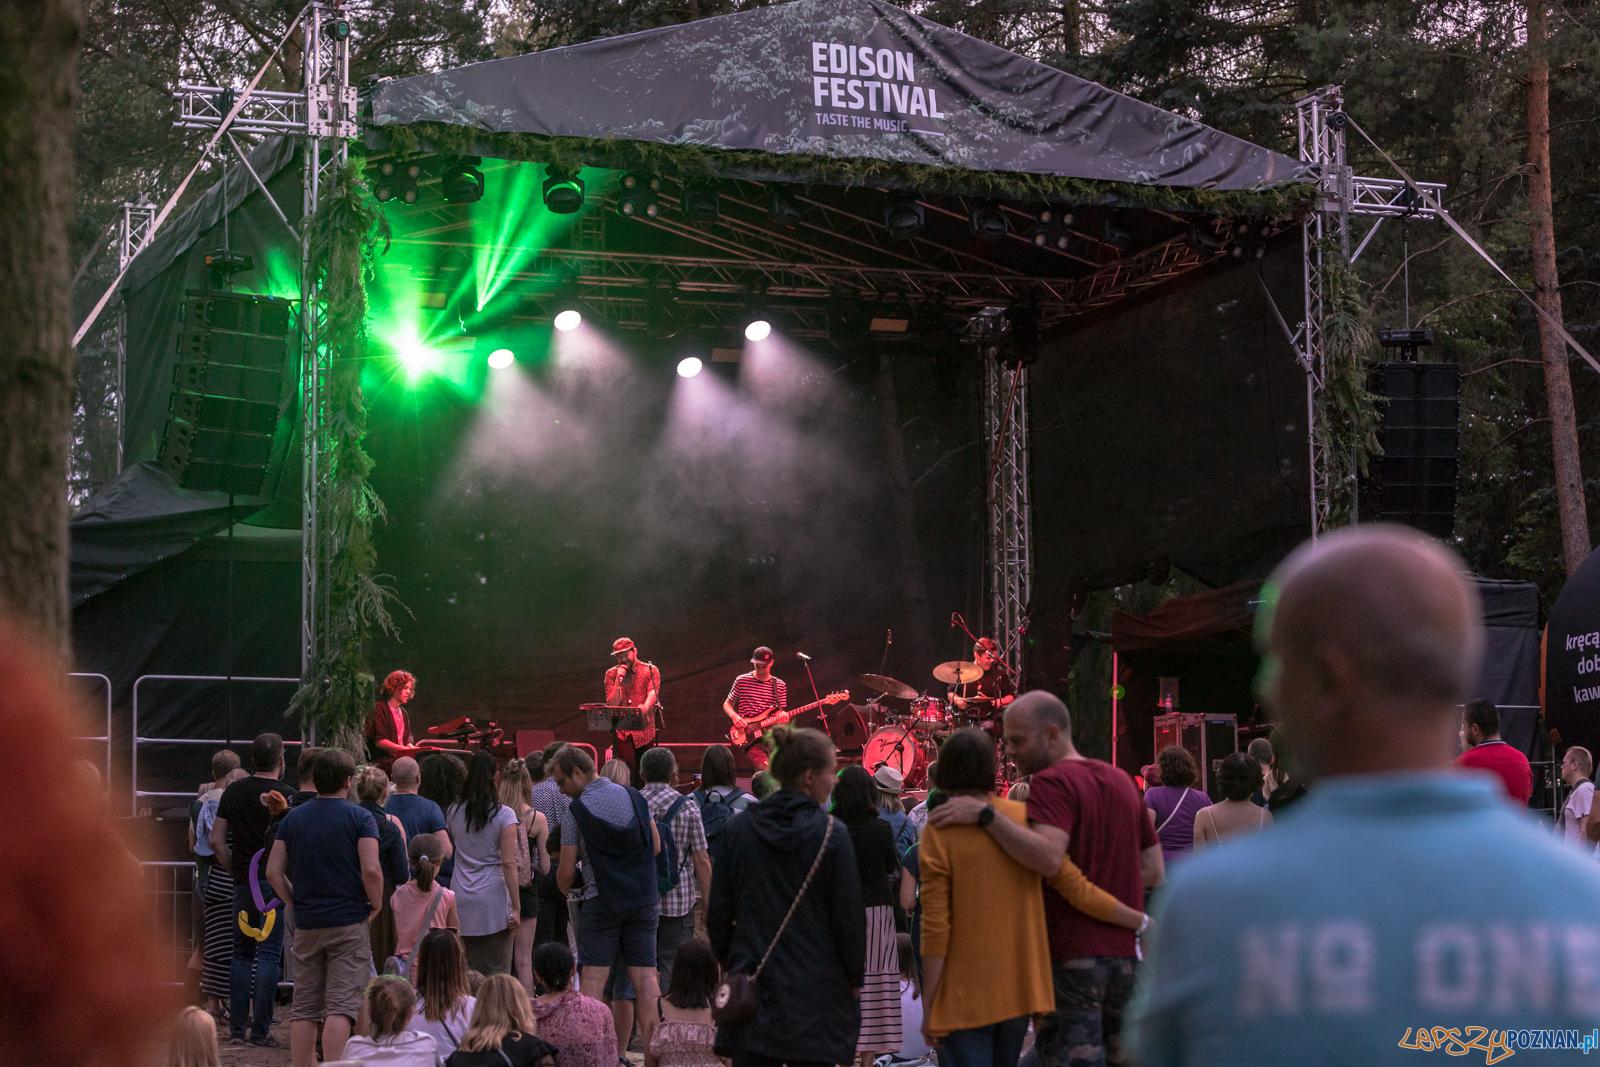 Edison Festival - Taste The Music - Mork  Foto: lepszyPOZNAN.pl/Piotr Rychter